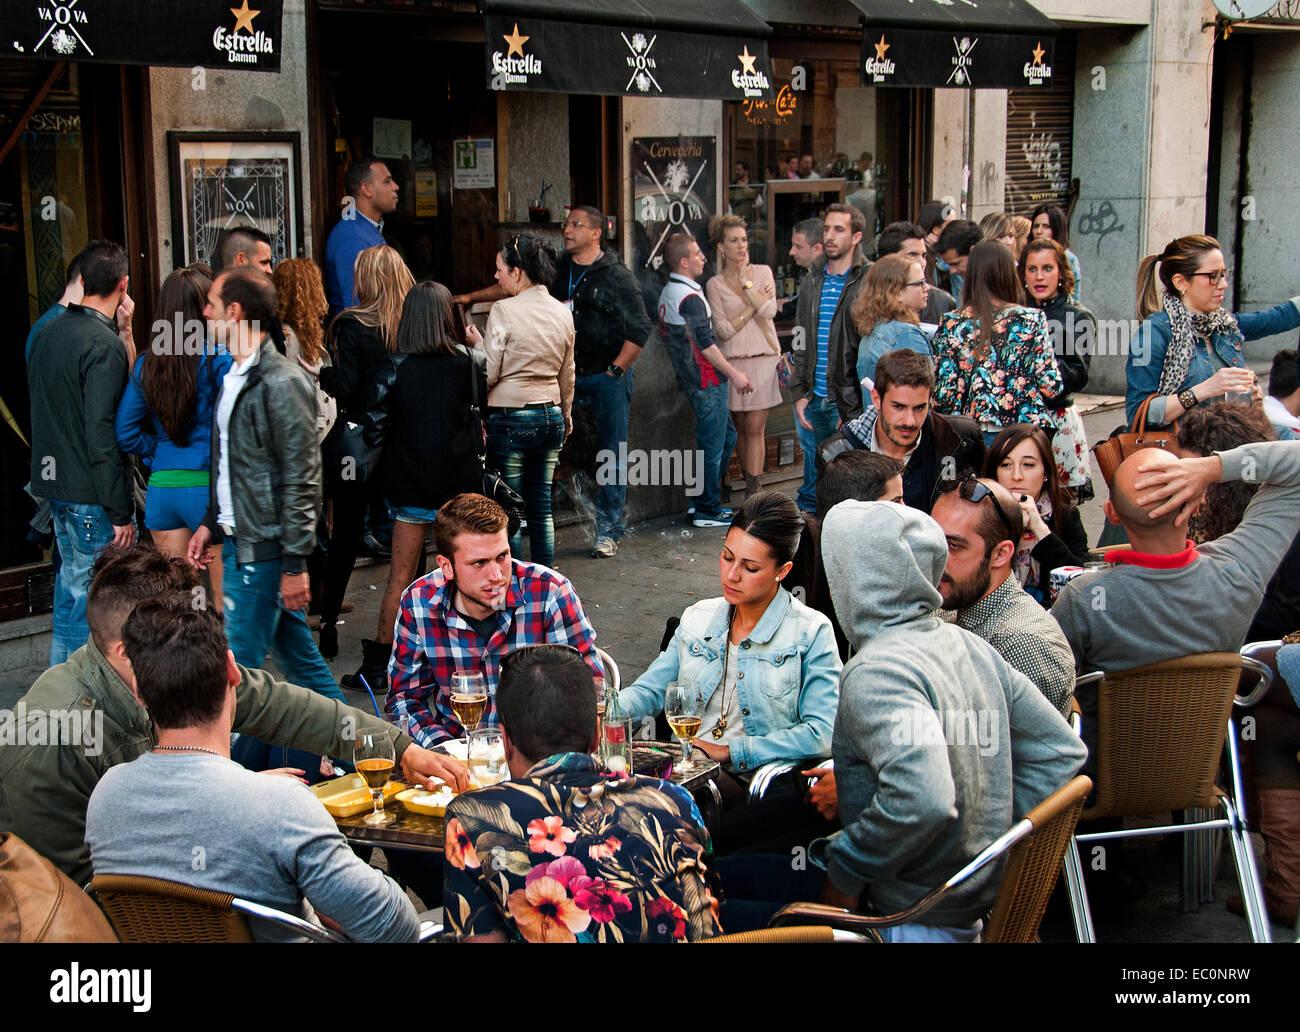 Tapas bars in the calle de la Cava Baja in the La Latina quarter, central Madrid, Spain - Stock Image